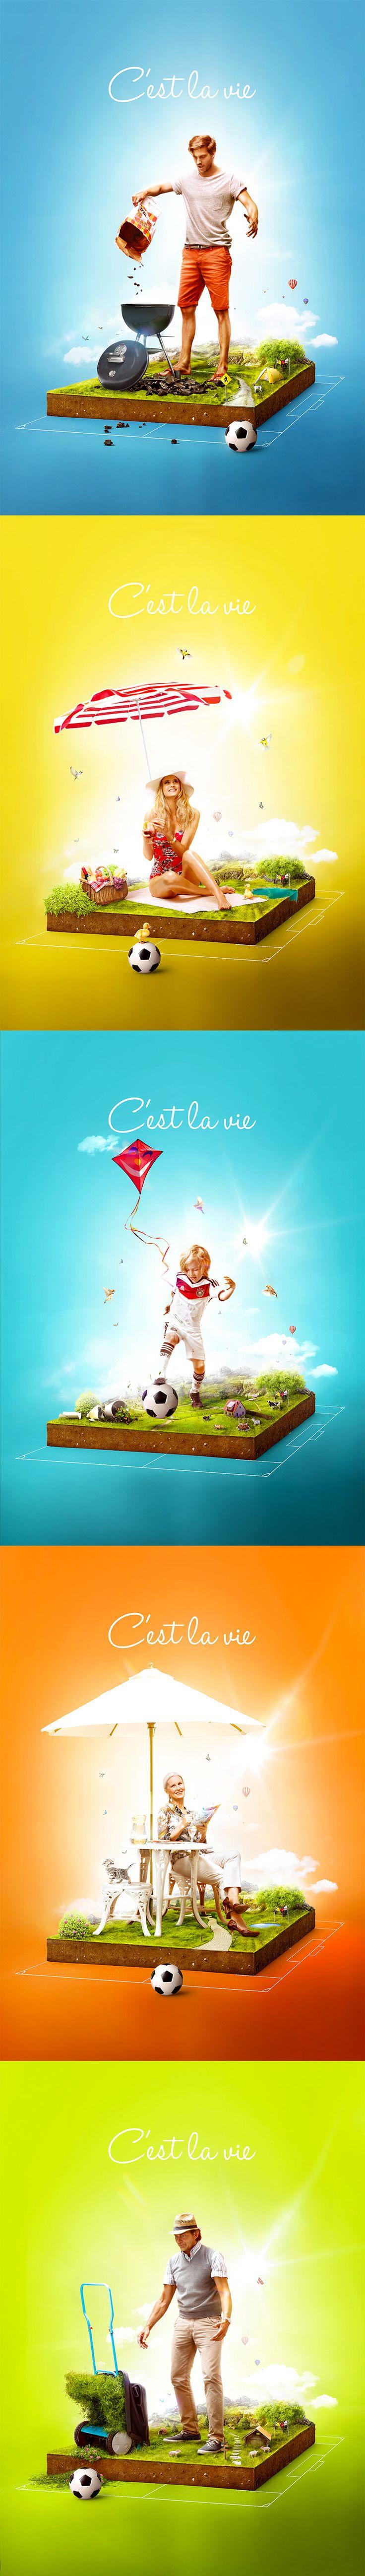 European Football Championship 2016